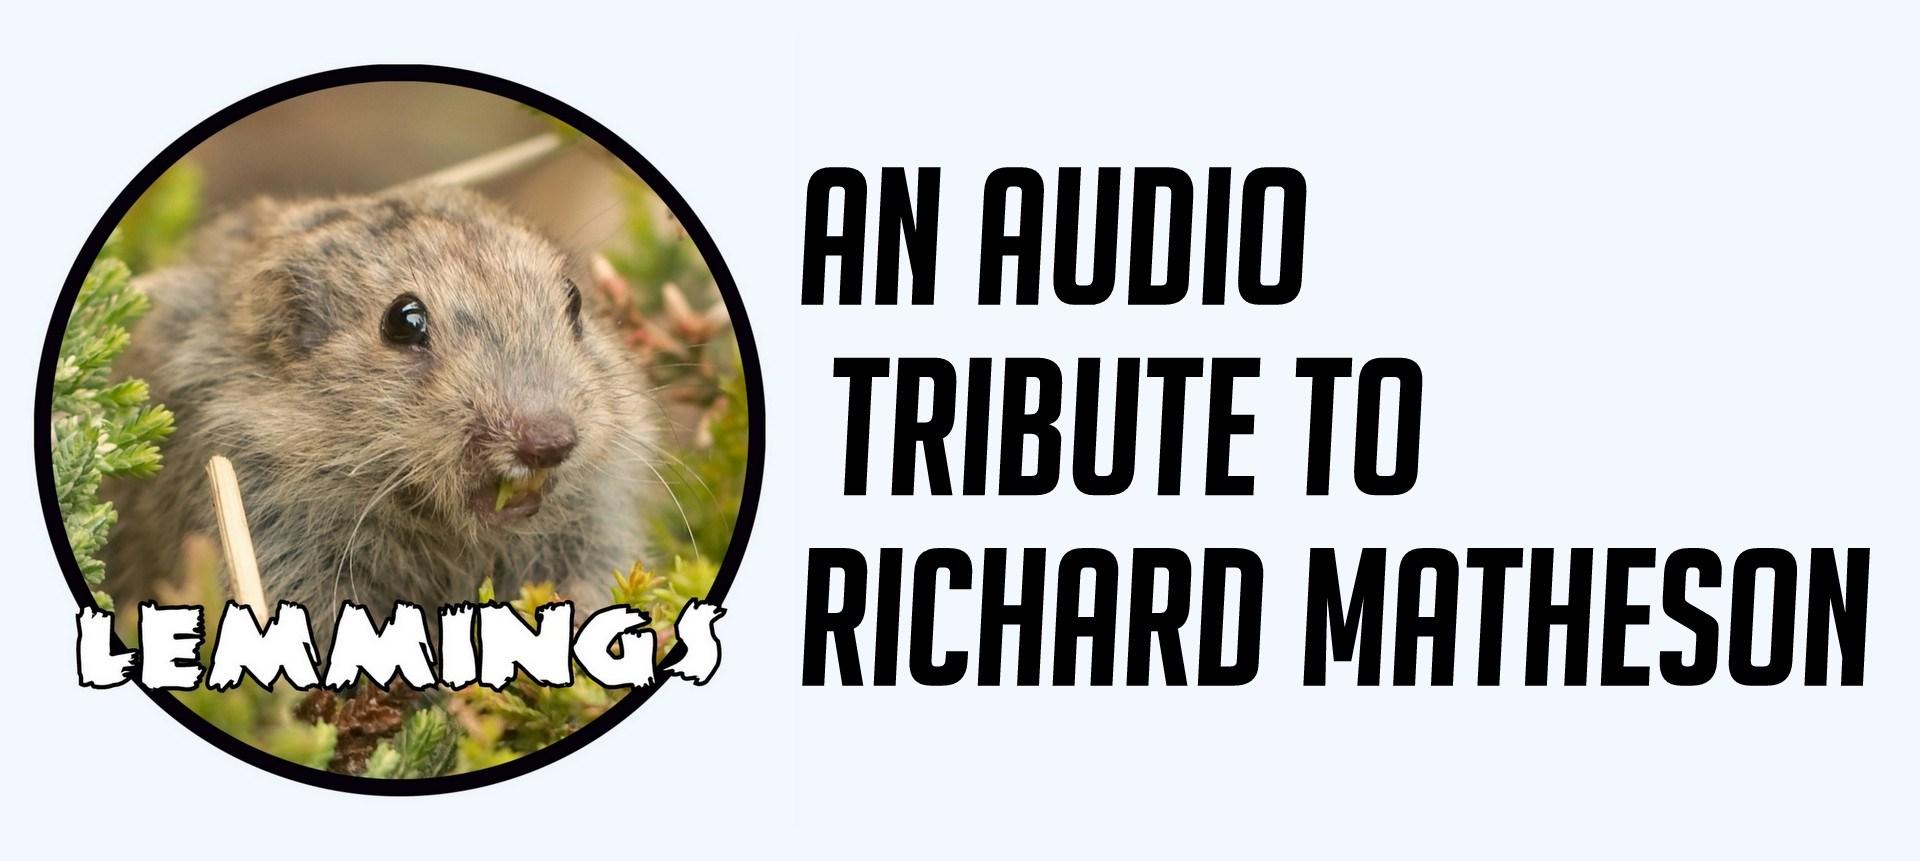 Lemmings Richard Matheson Banner Image - Photo: Flickr Sander van der Wel CC BY-SA 2.0.jpg